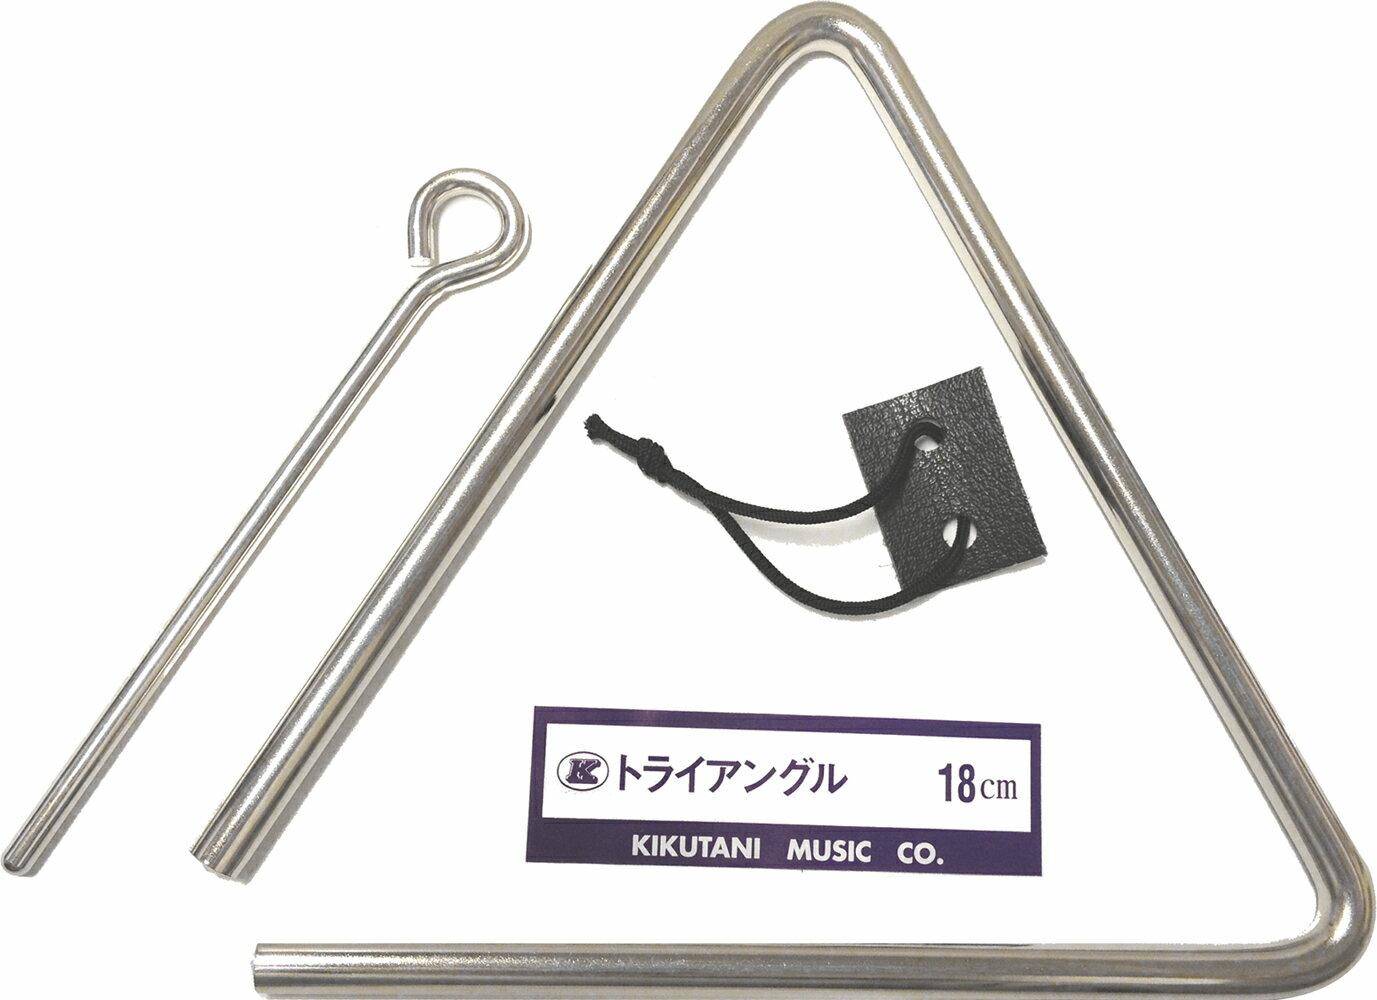 Kikutani ( キクタニ ) トライアングル 18cm 三角形 打楽器 金属棒 ( バチ ) 吊り皮 ヒモ付き 合奏 パーカッション 楽器 T-18 triangle (北海道/沖縄/離島不可=送料実費請求)